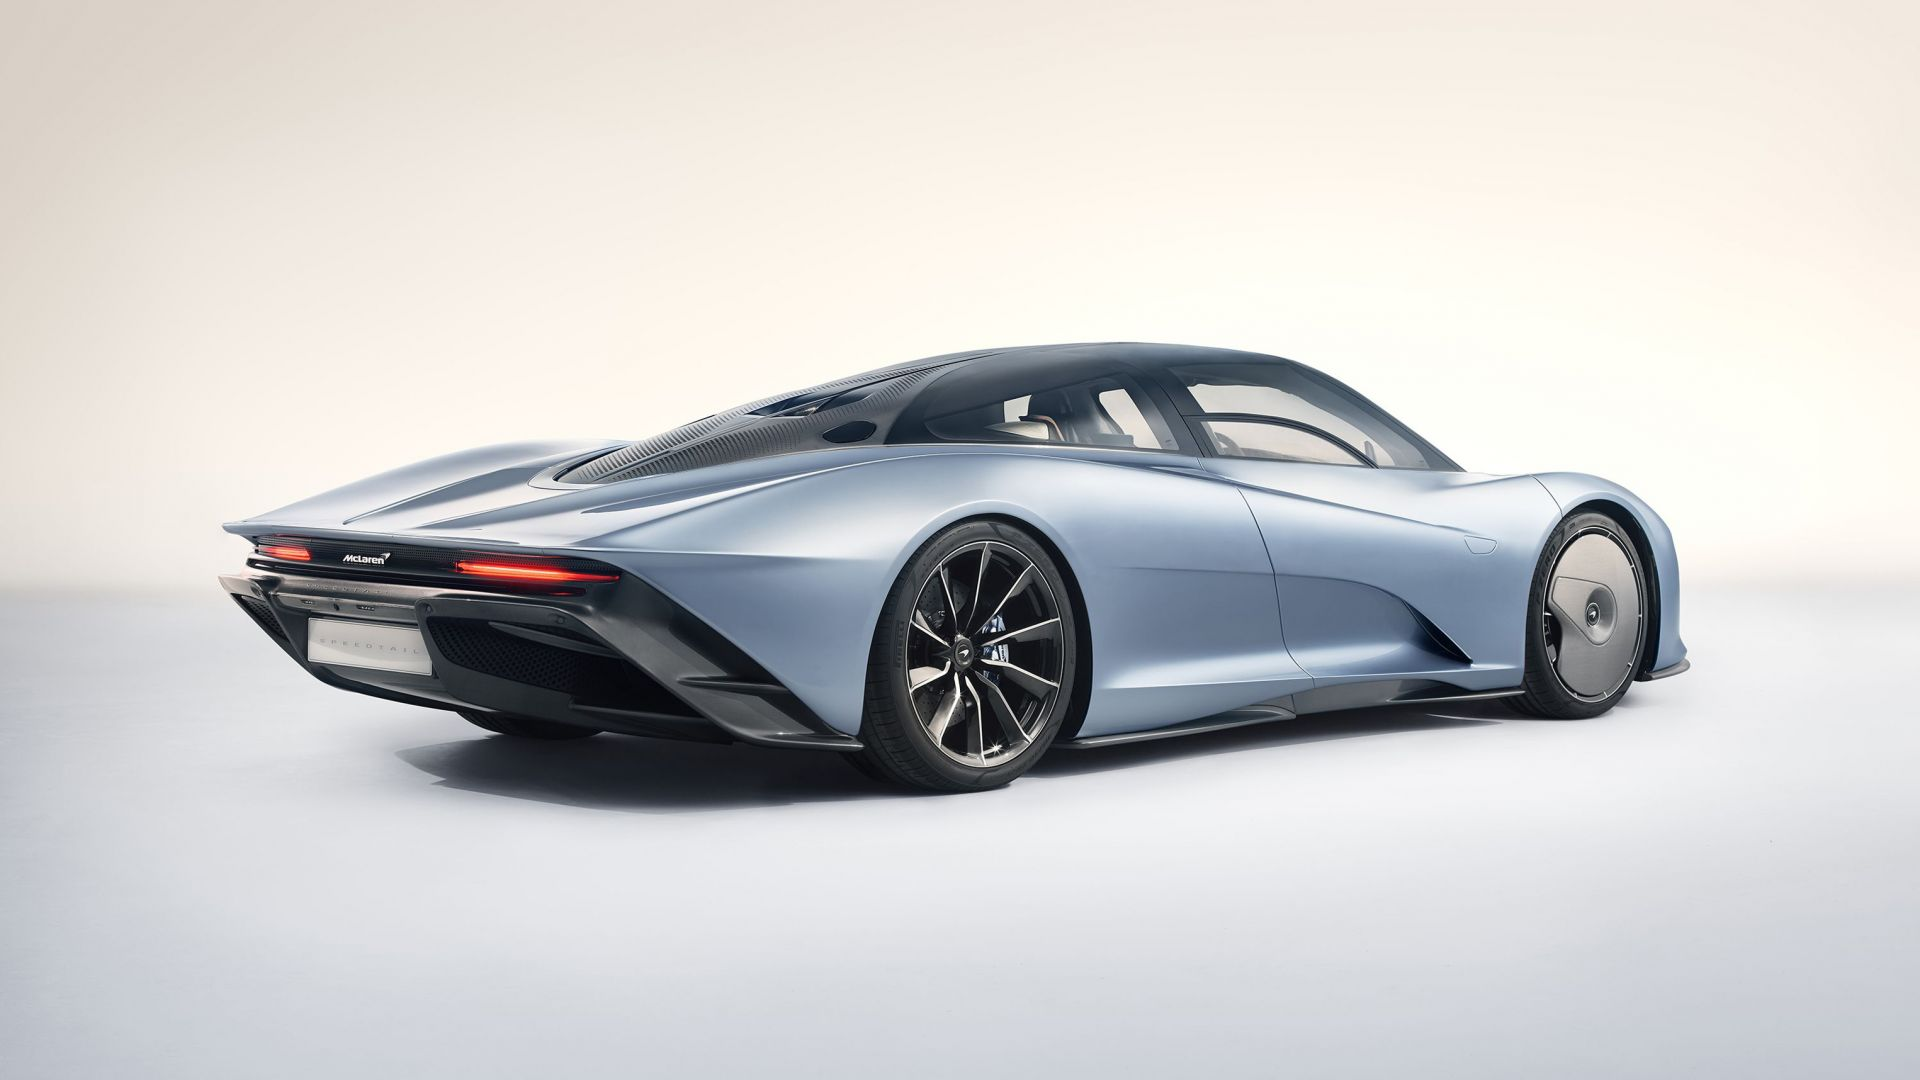 Wallpaper McLaren Speedtail supercar electric cars 4K Cars 1920x1080